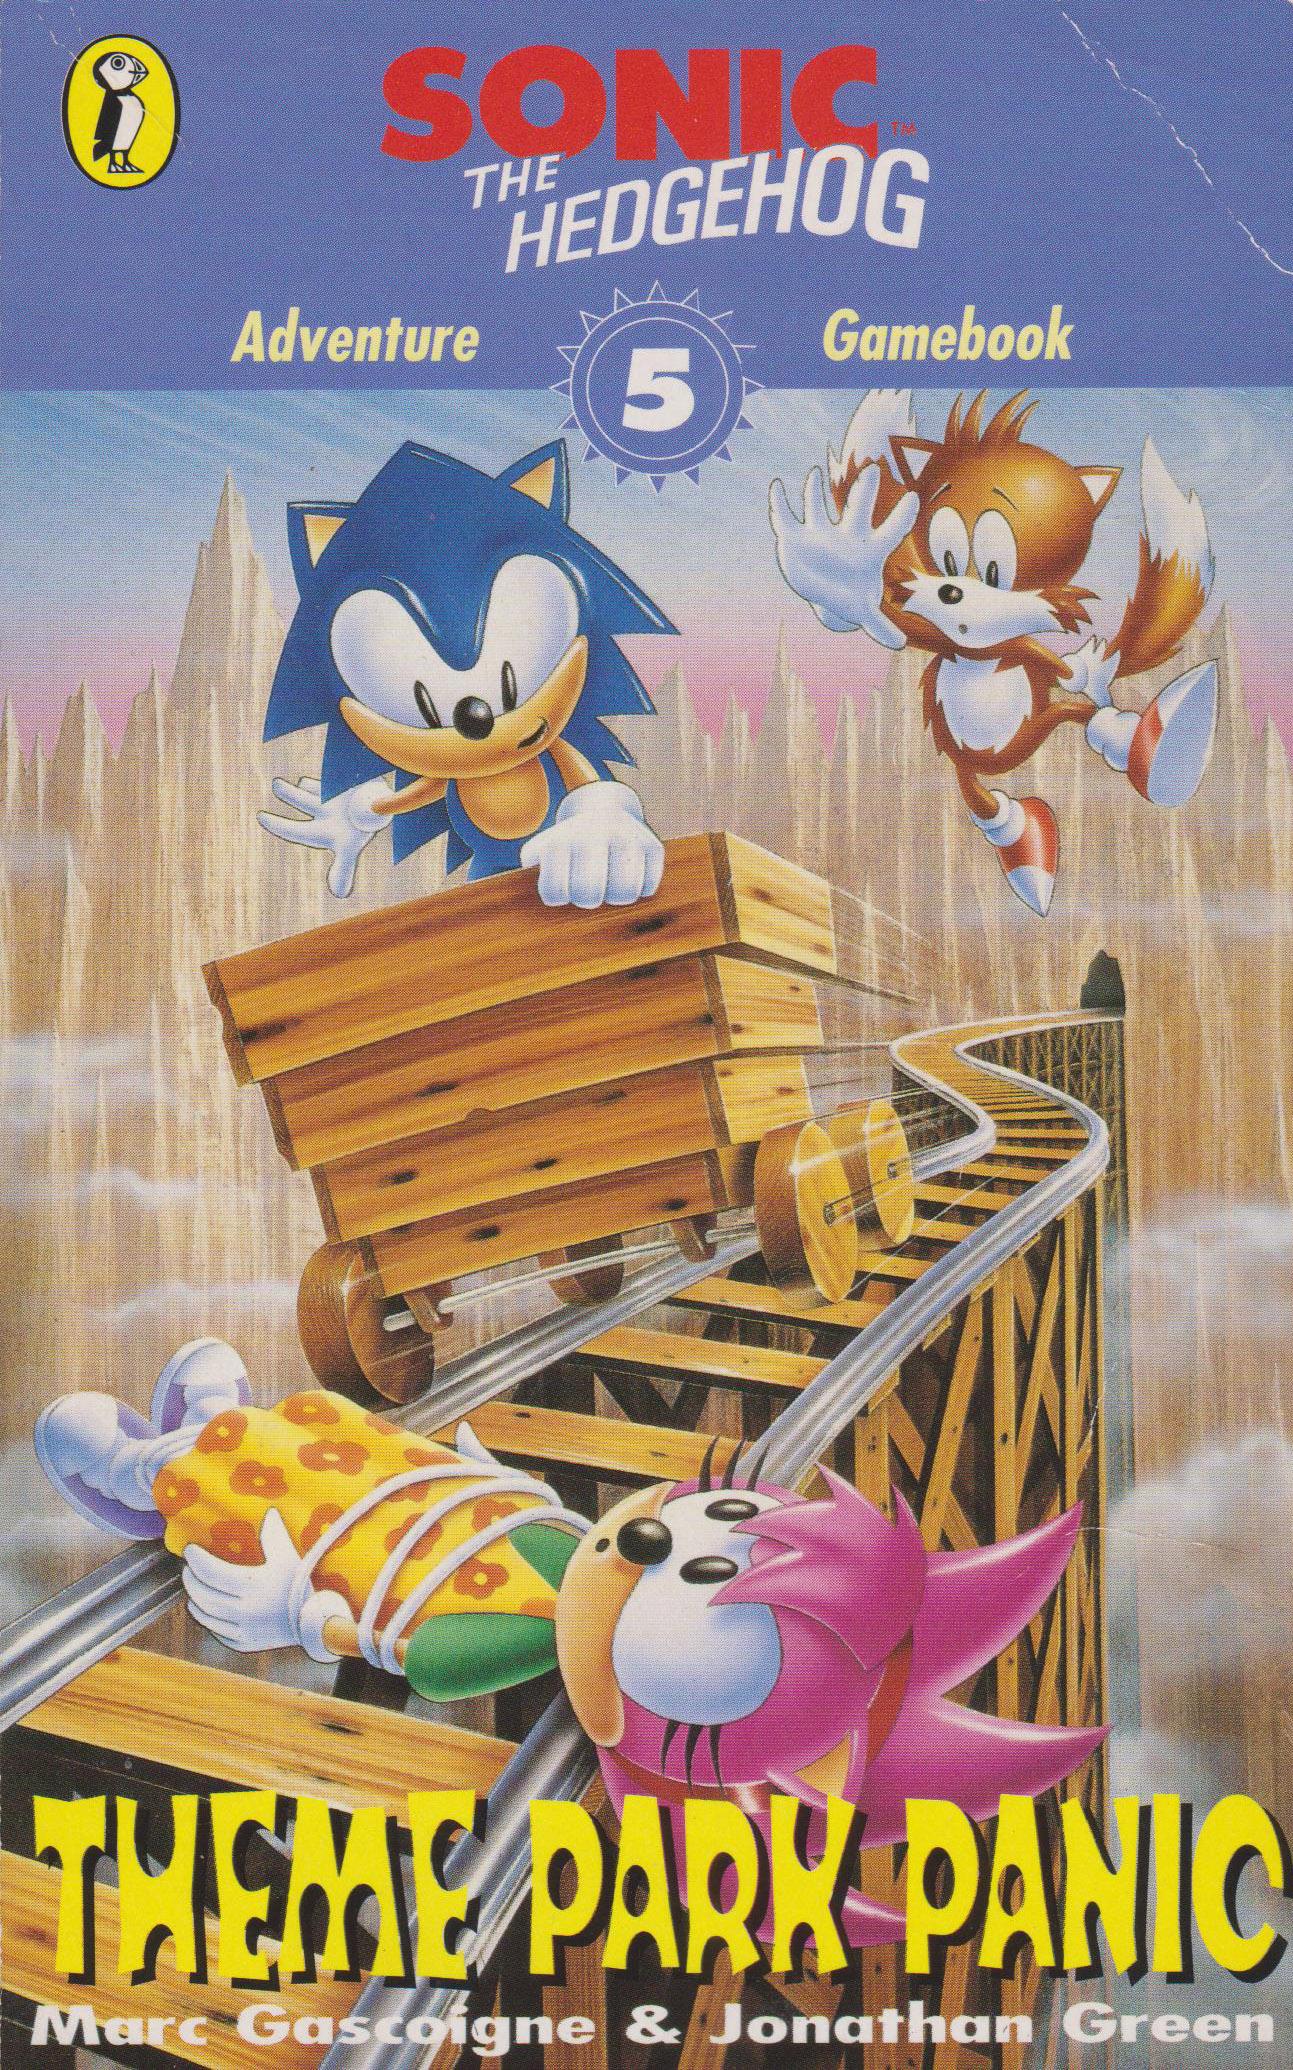 Sonic the Hedgehog Adventure Gamebook 5: Theme Park Panic